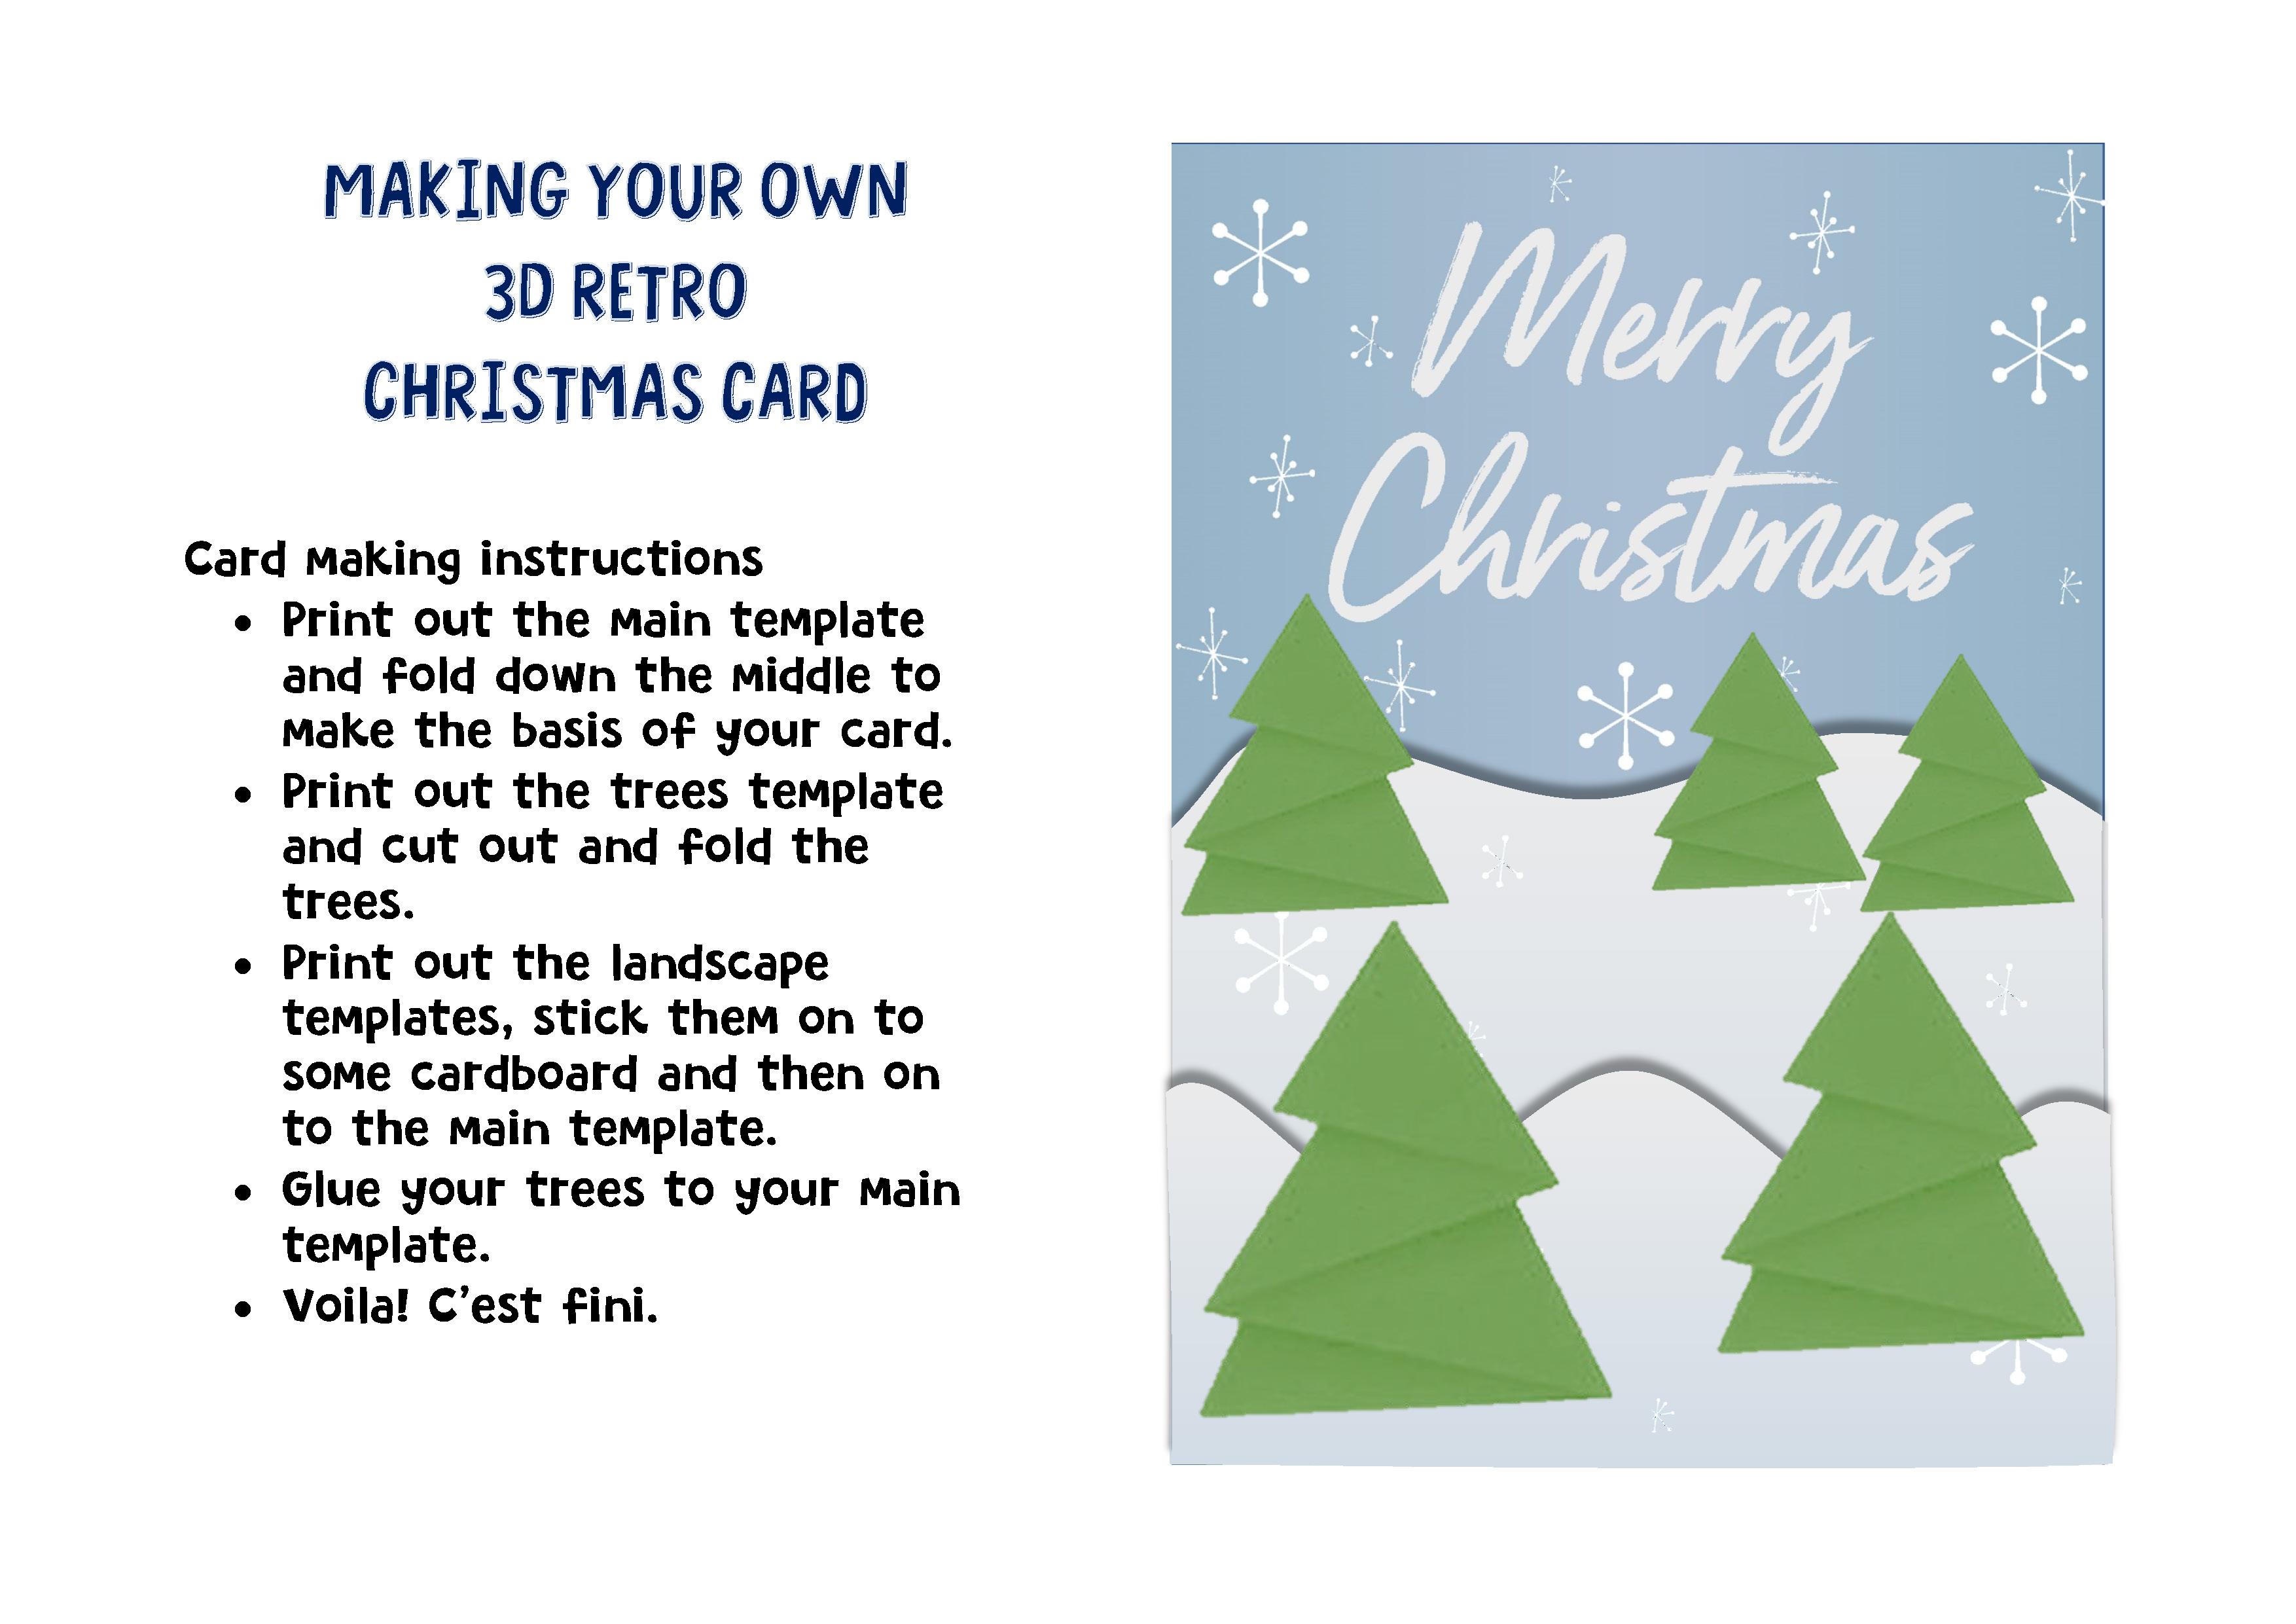 Christmas Card Template.3d Retro Christmas Card Template